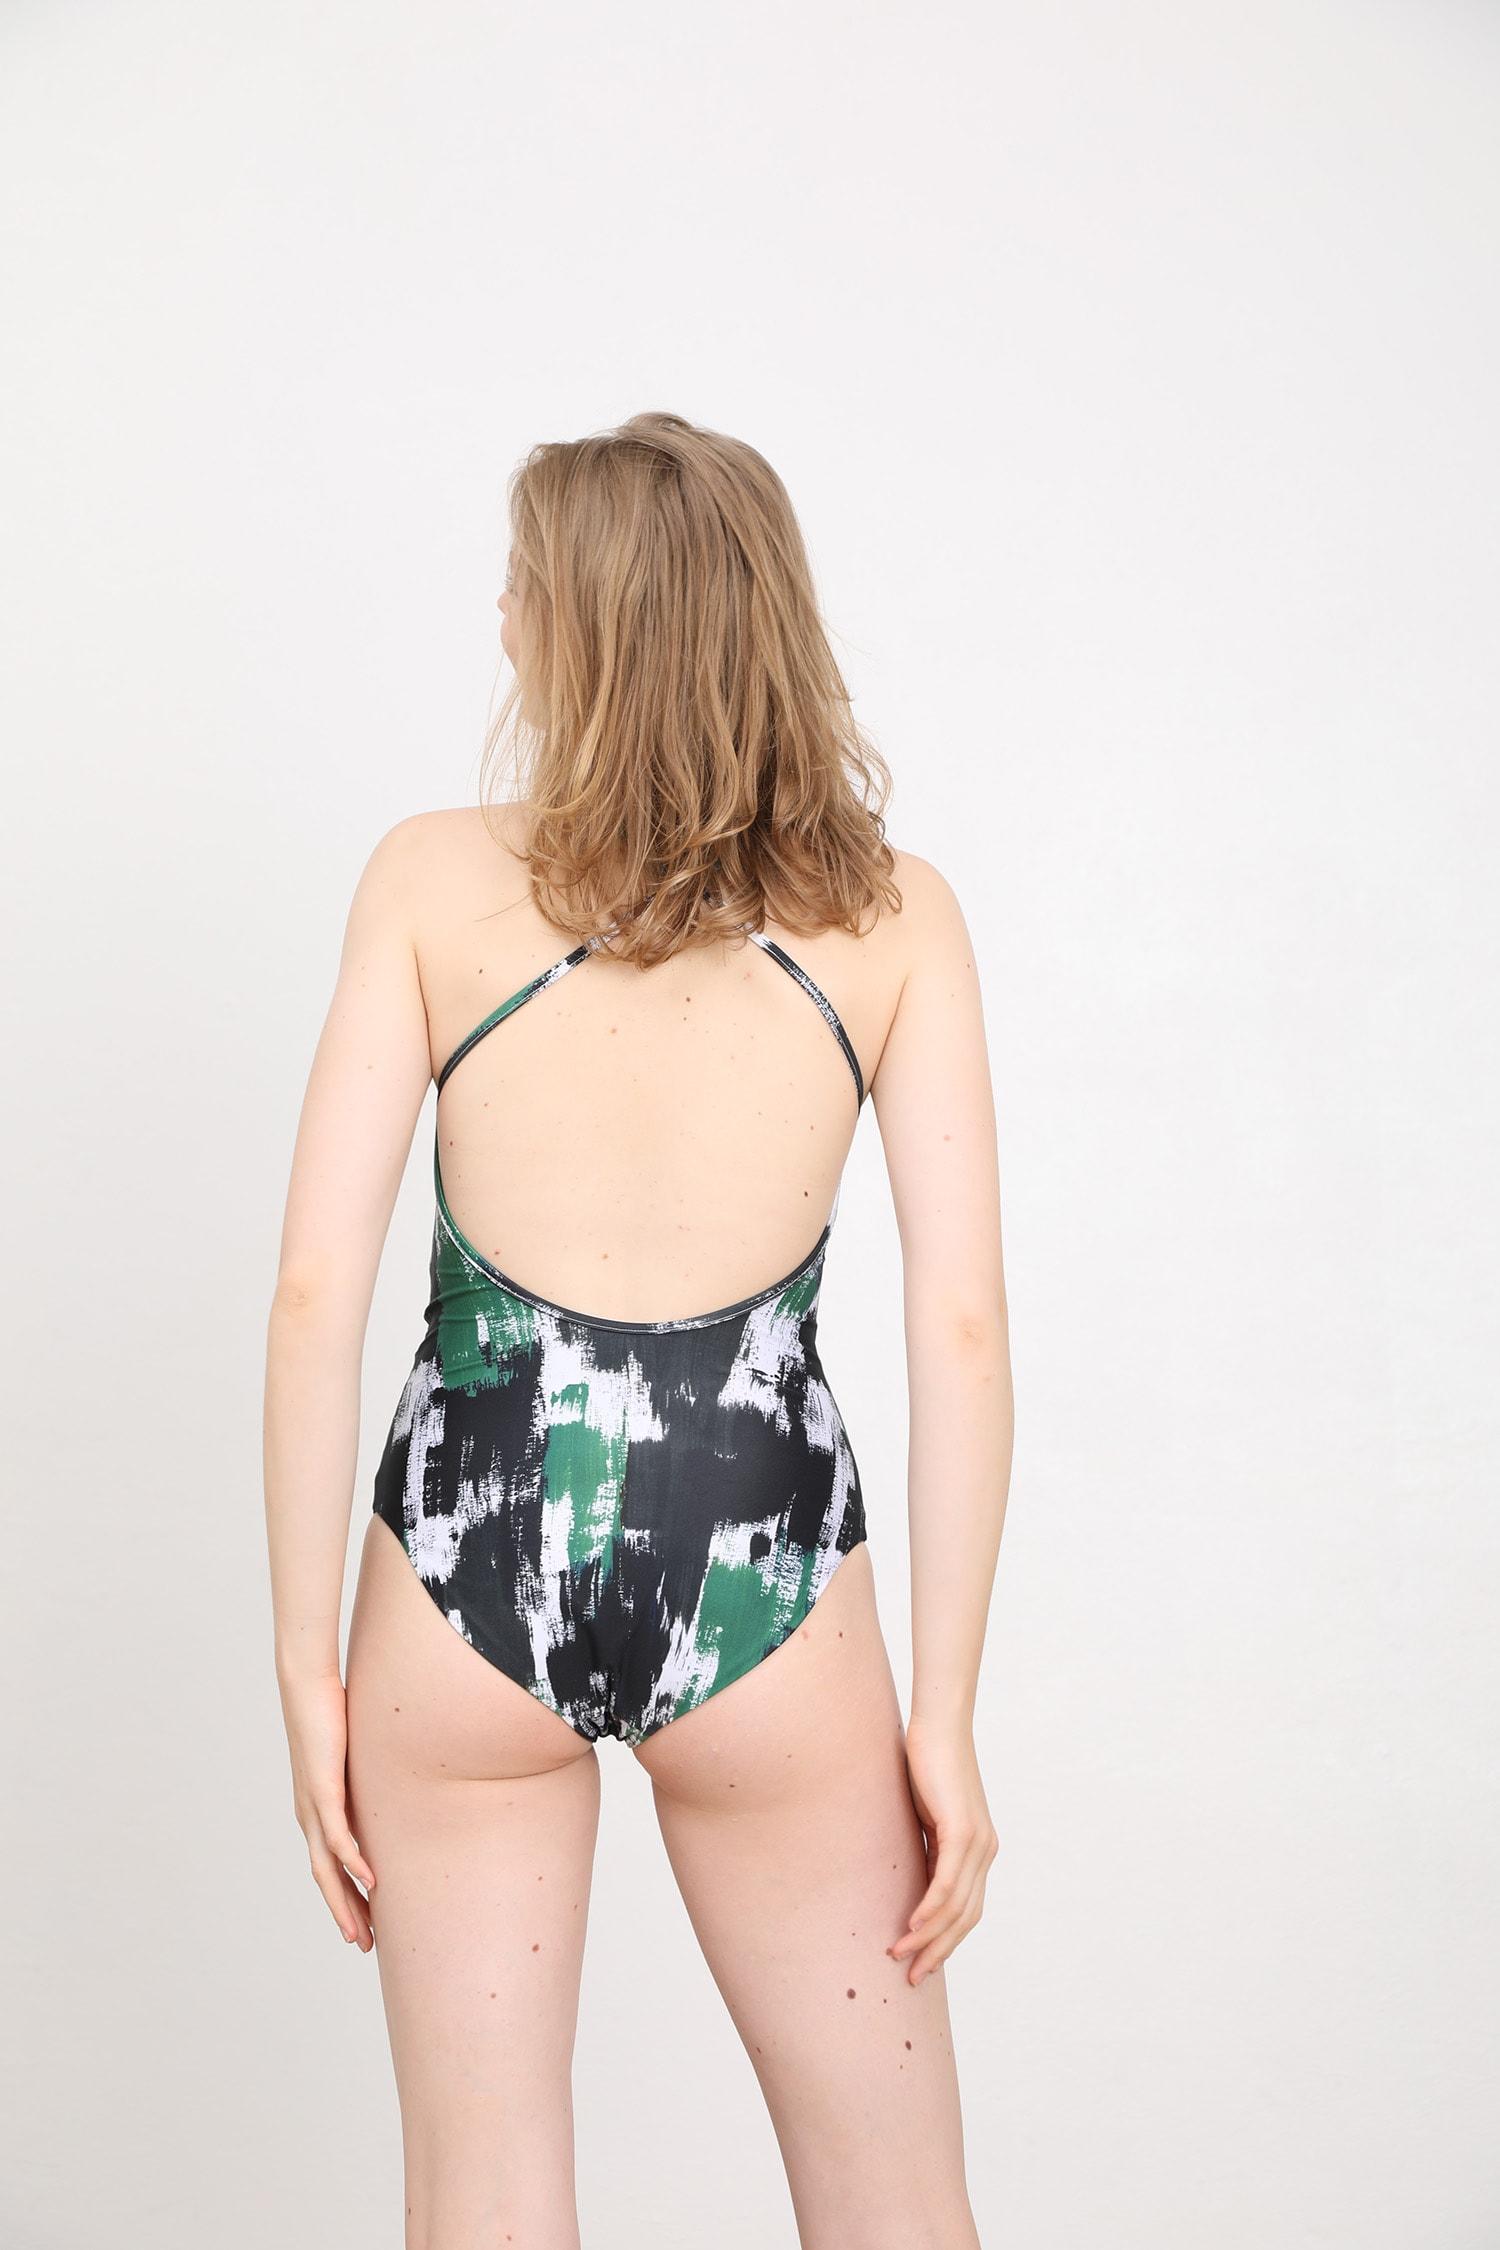 margaret and hermione_ss19_swimsuit no2_brush black_197,00eur_hinten_online